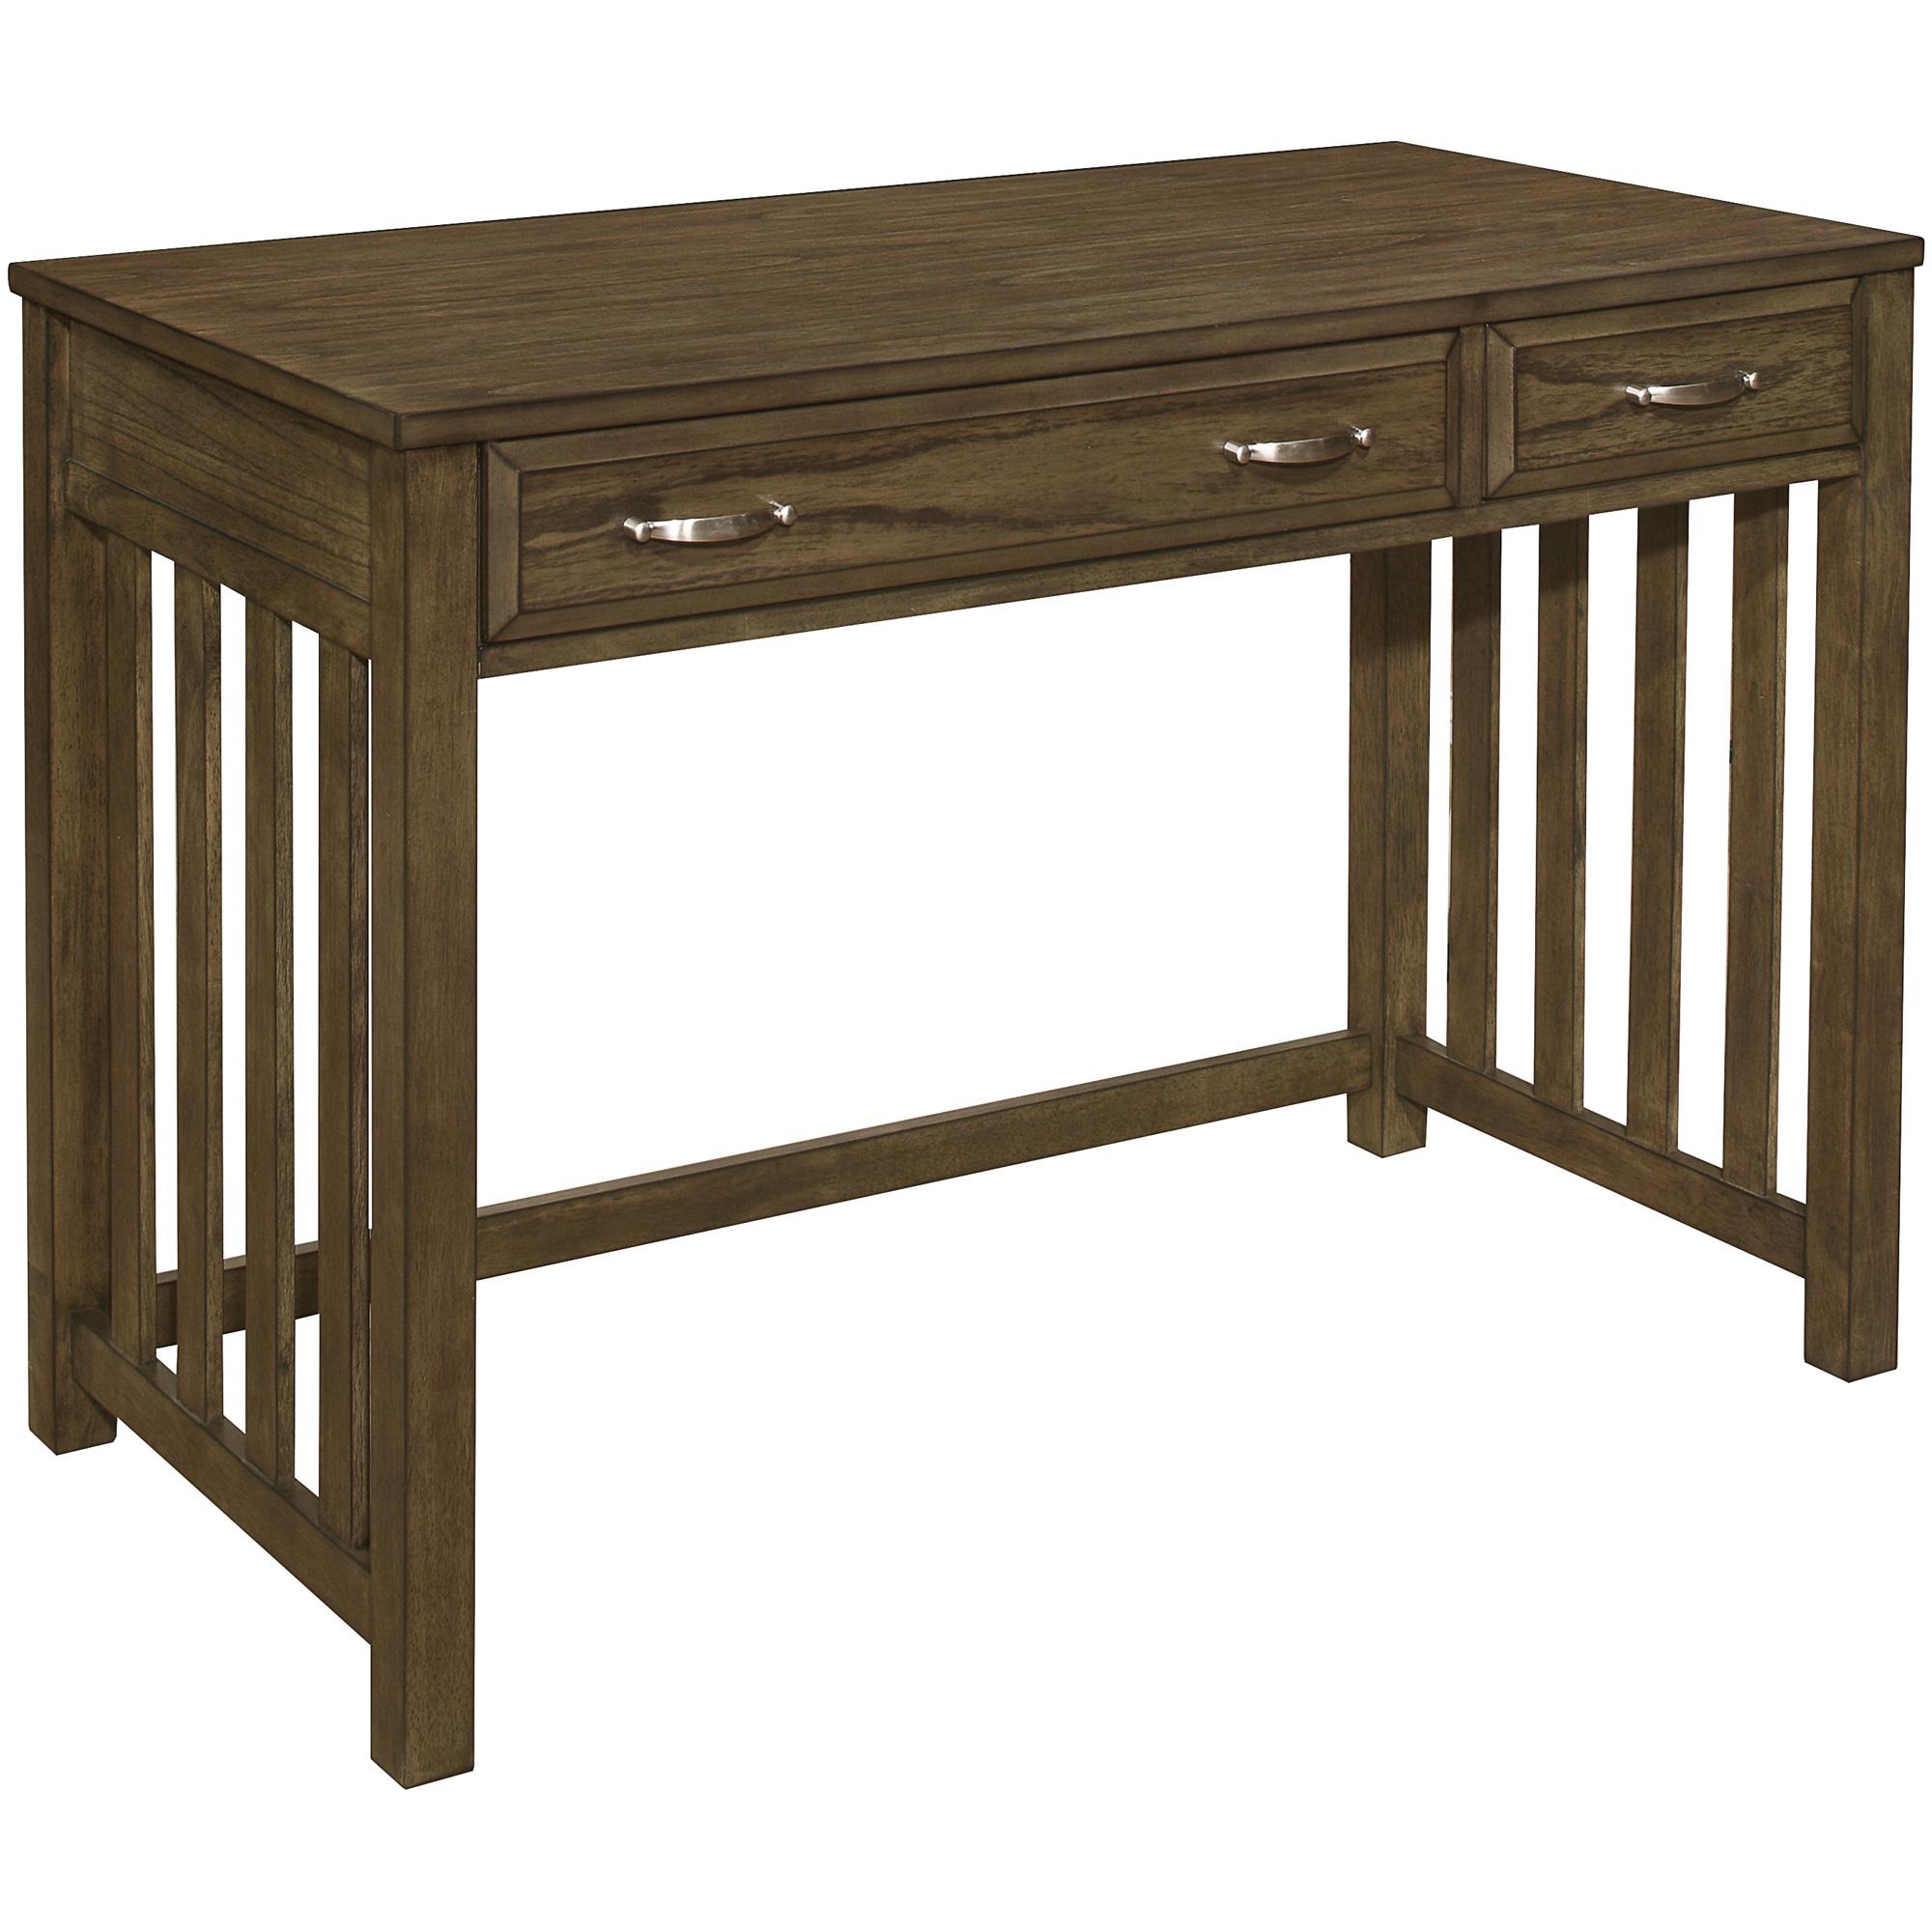 Top Line | Blanche Brown 2 Drawer Desk